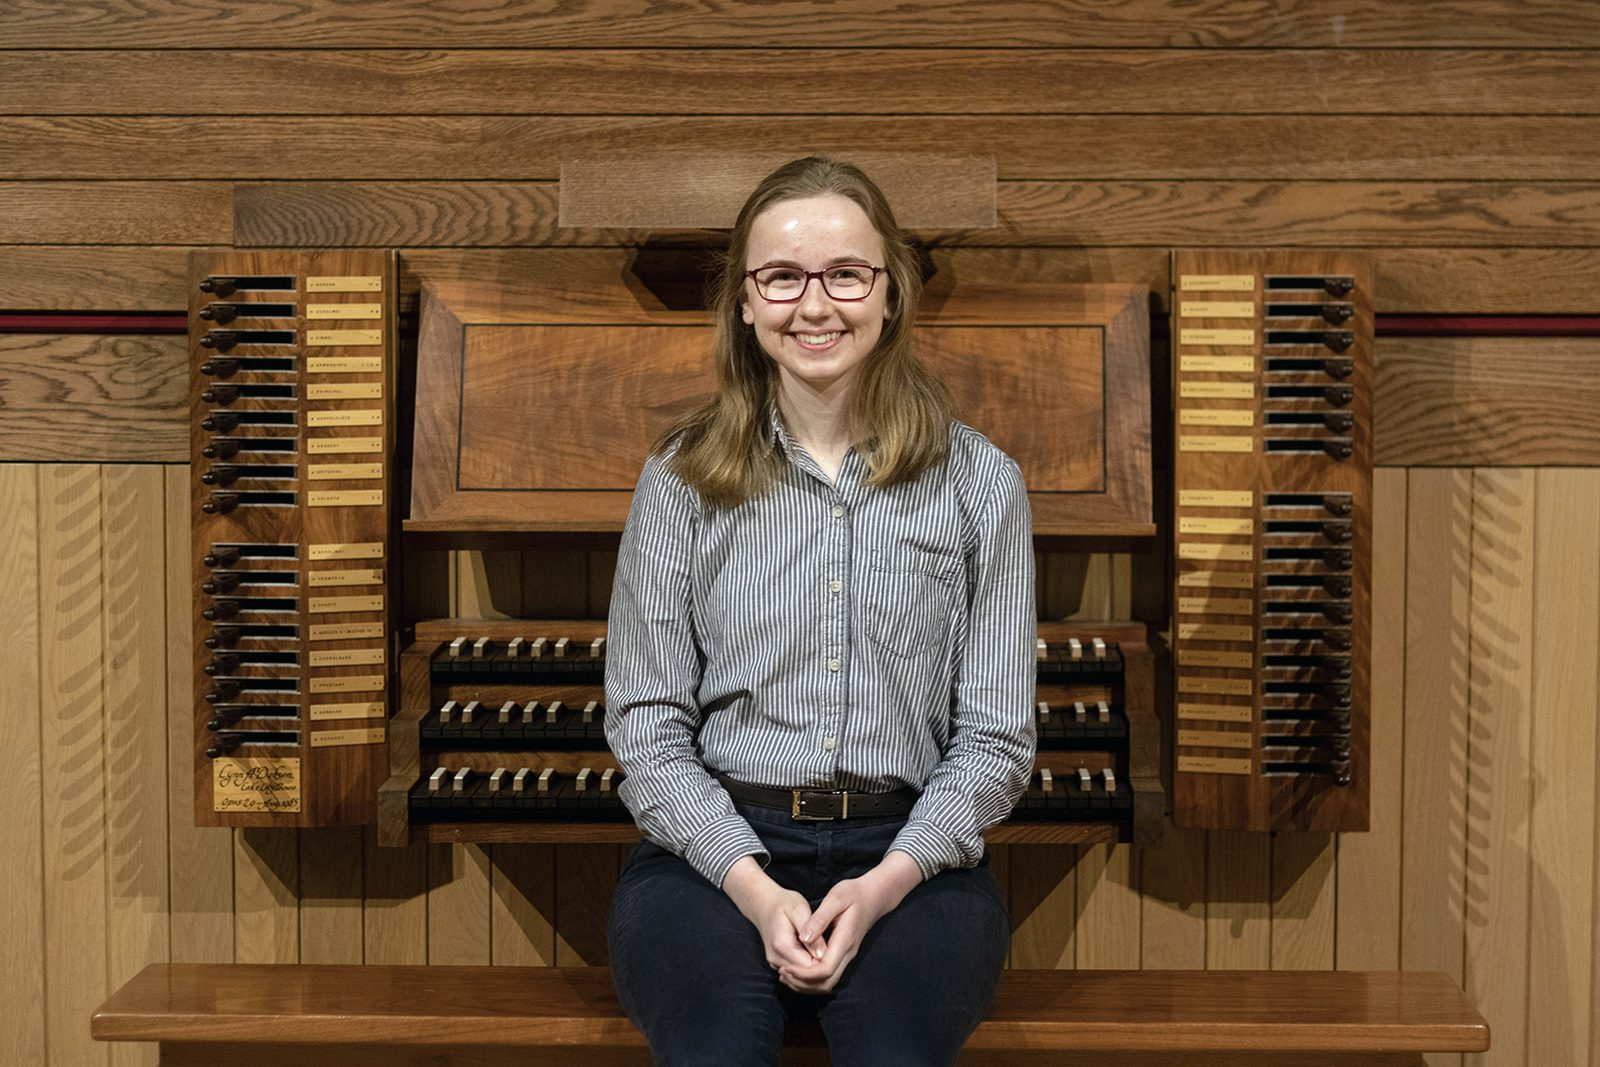 Portrait of Katie Gunn in front of an organ.